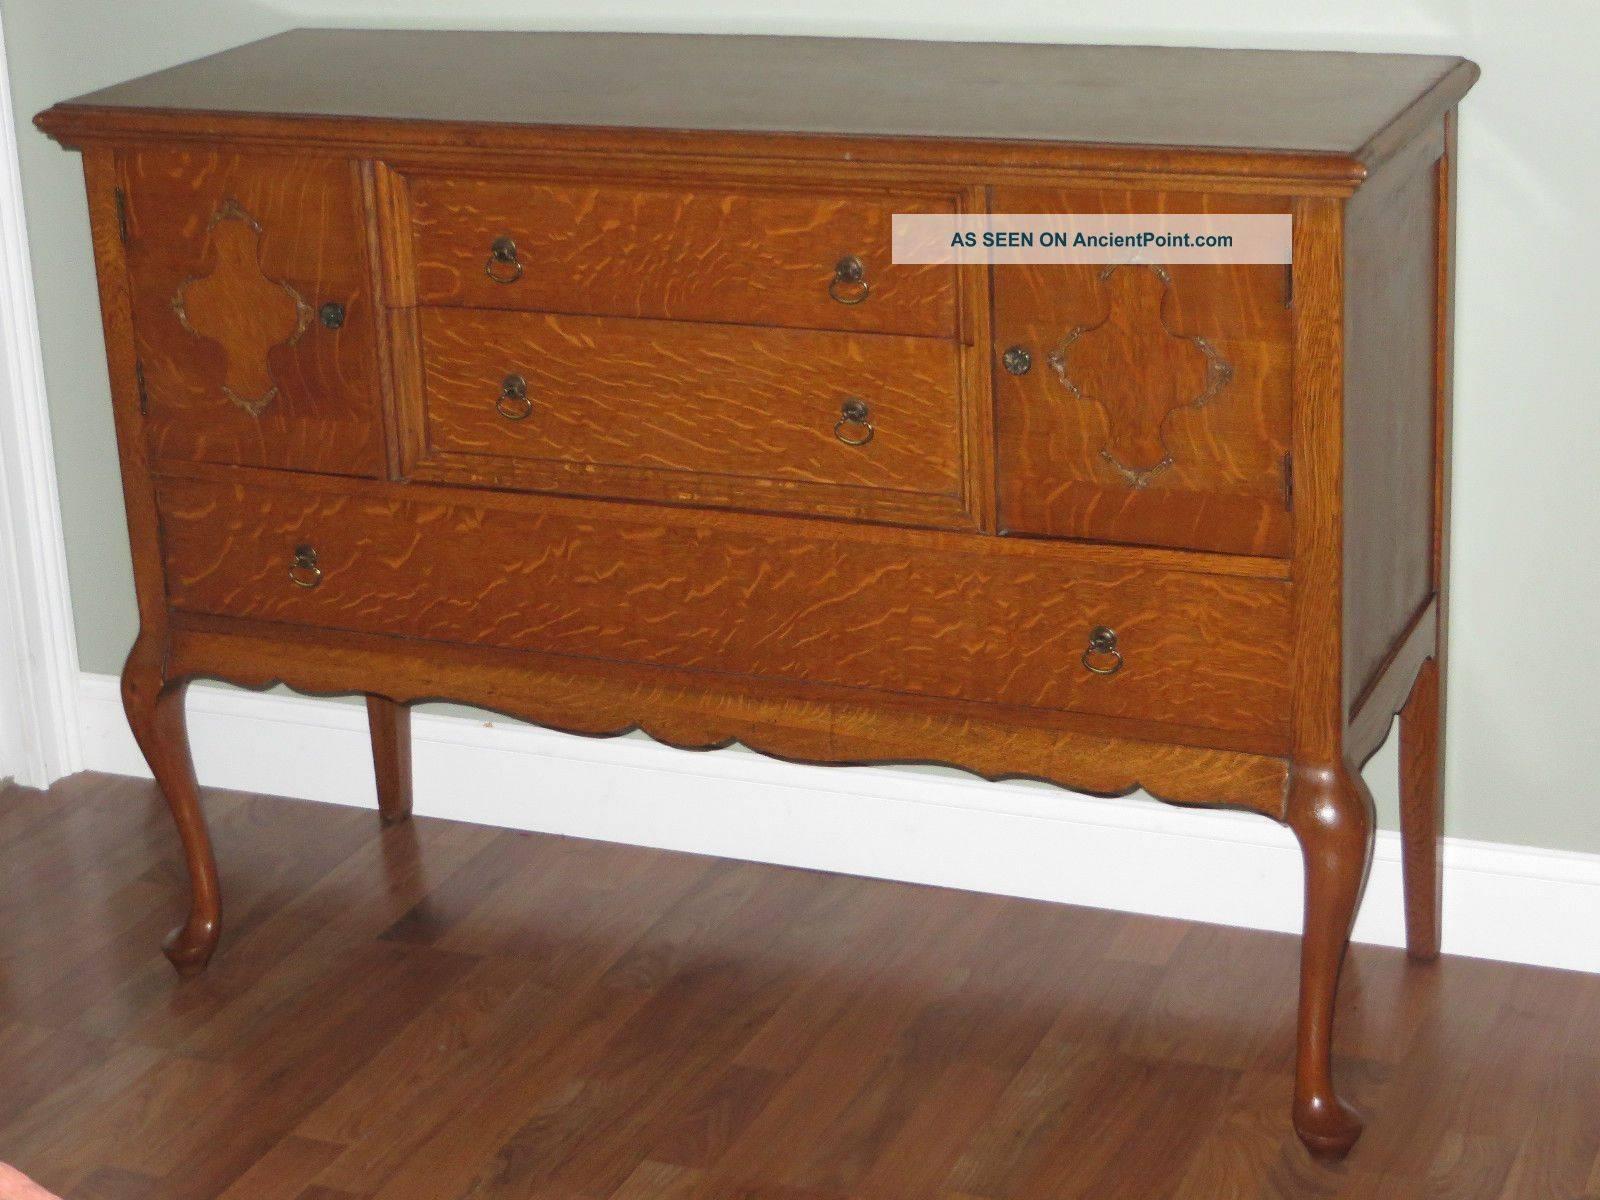 Antique Buffet Value Antique Tiger Oak Sideboard Buffet Server with regard to Antique Sideboard Buffets (Image 2 of 15)